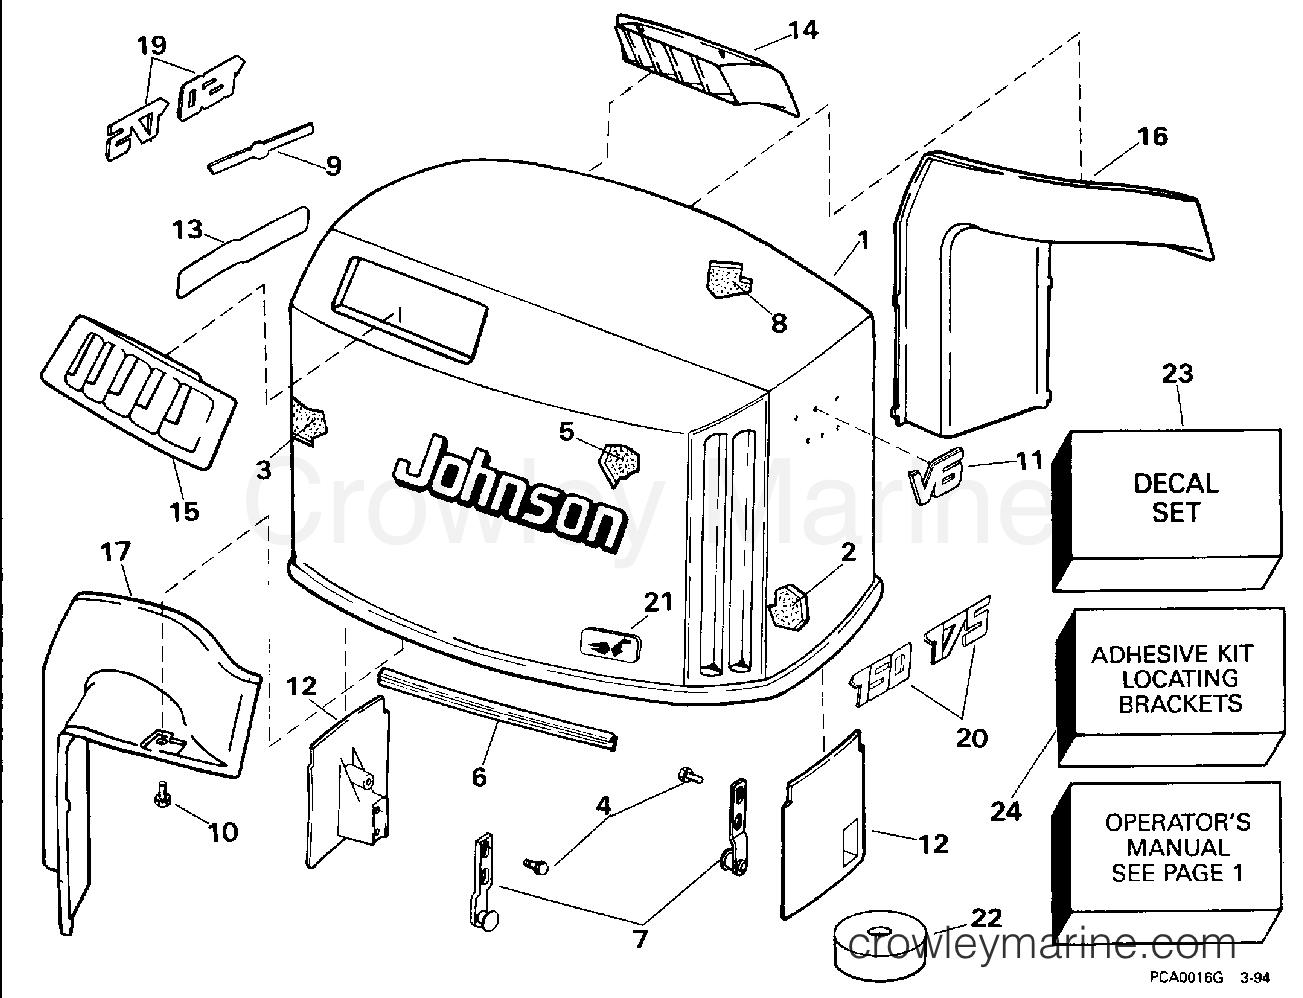 1994 OMC Quiet Rider 150 - 150SHLERC ENGINE COVER - JOHNSON section